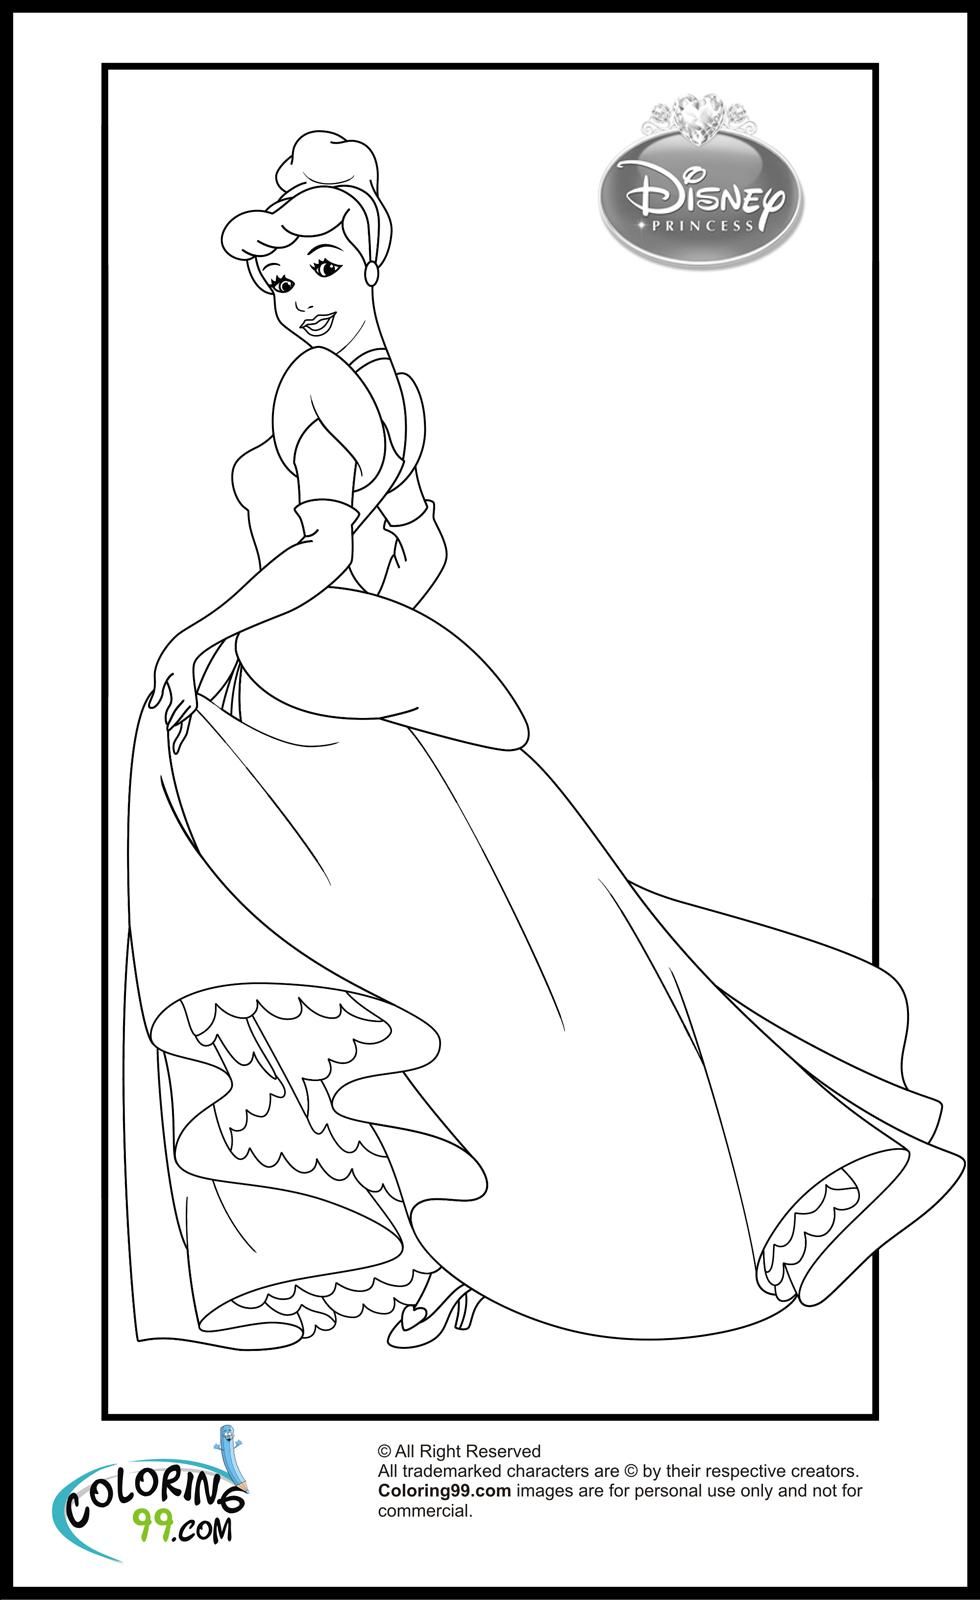 Disney Princess Cinderella Coloring Pages | Minister Coloring